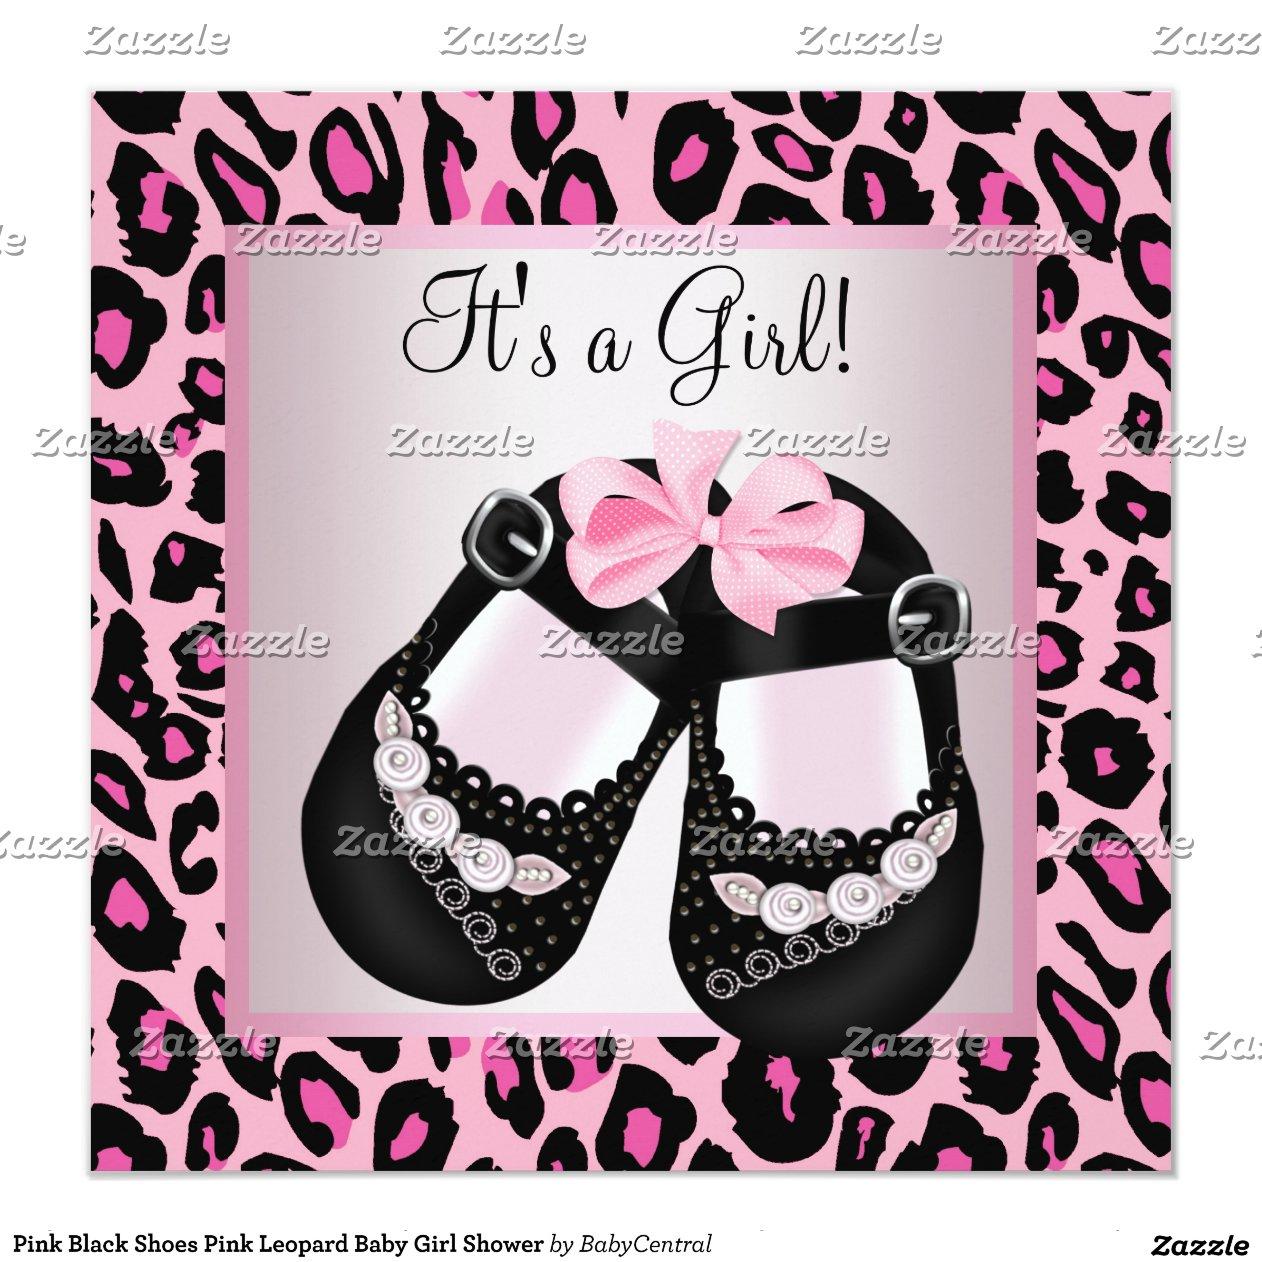 pink black shoes pink leopard baby shower 5 25